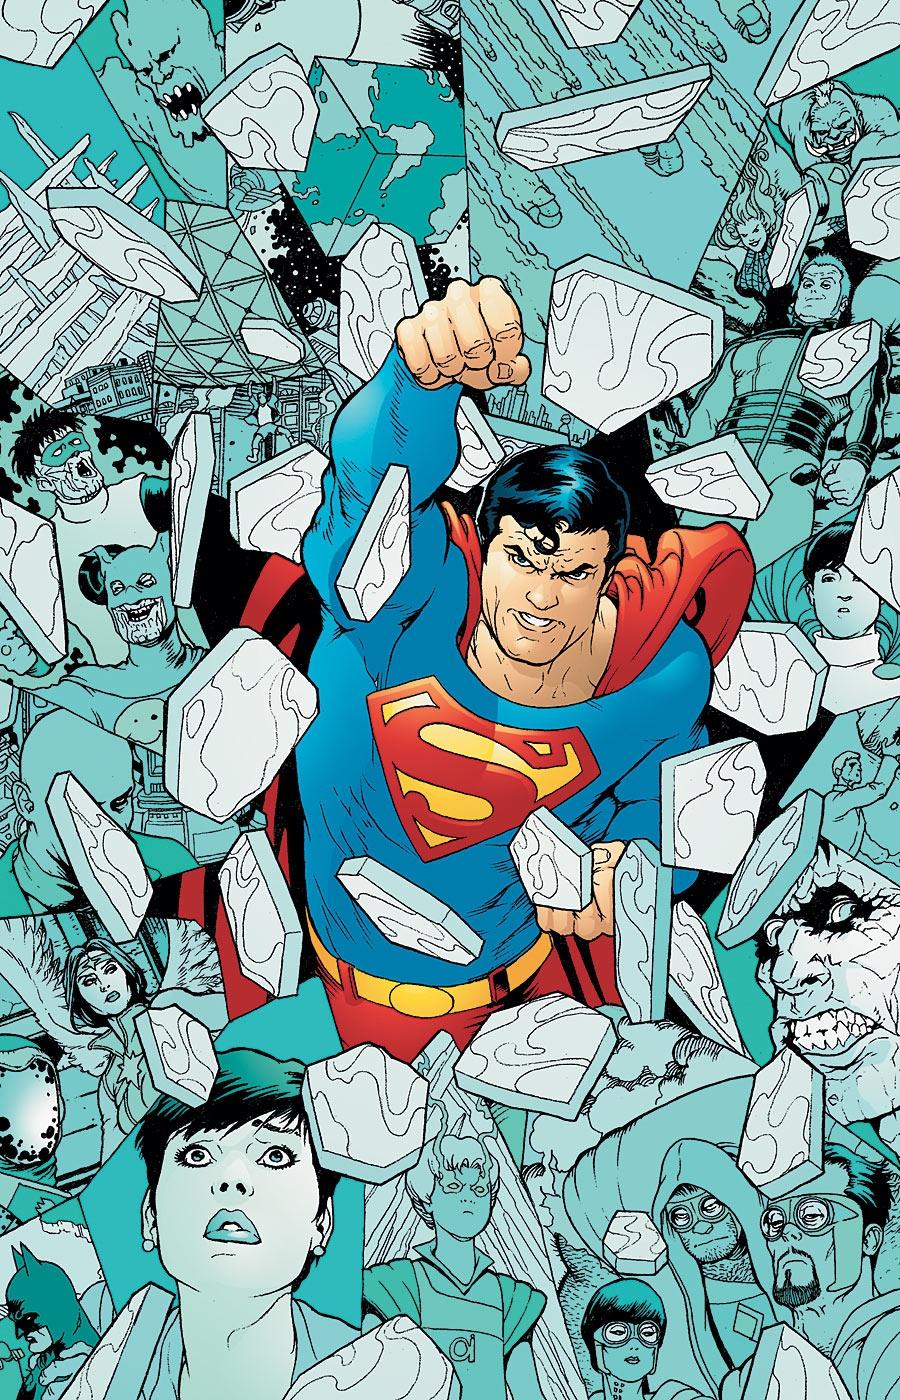 Action Comics Vol 1 864 textless.jpg